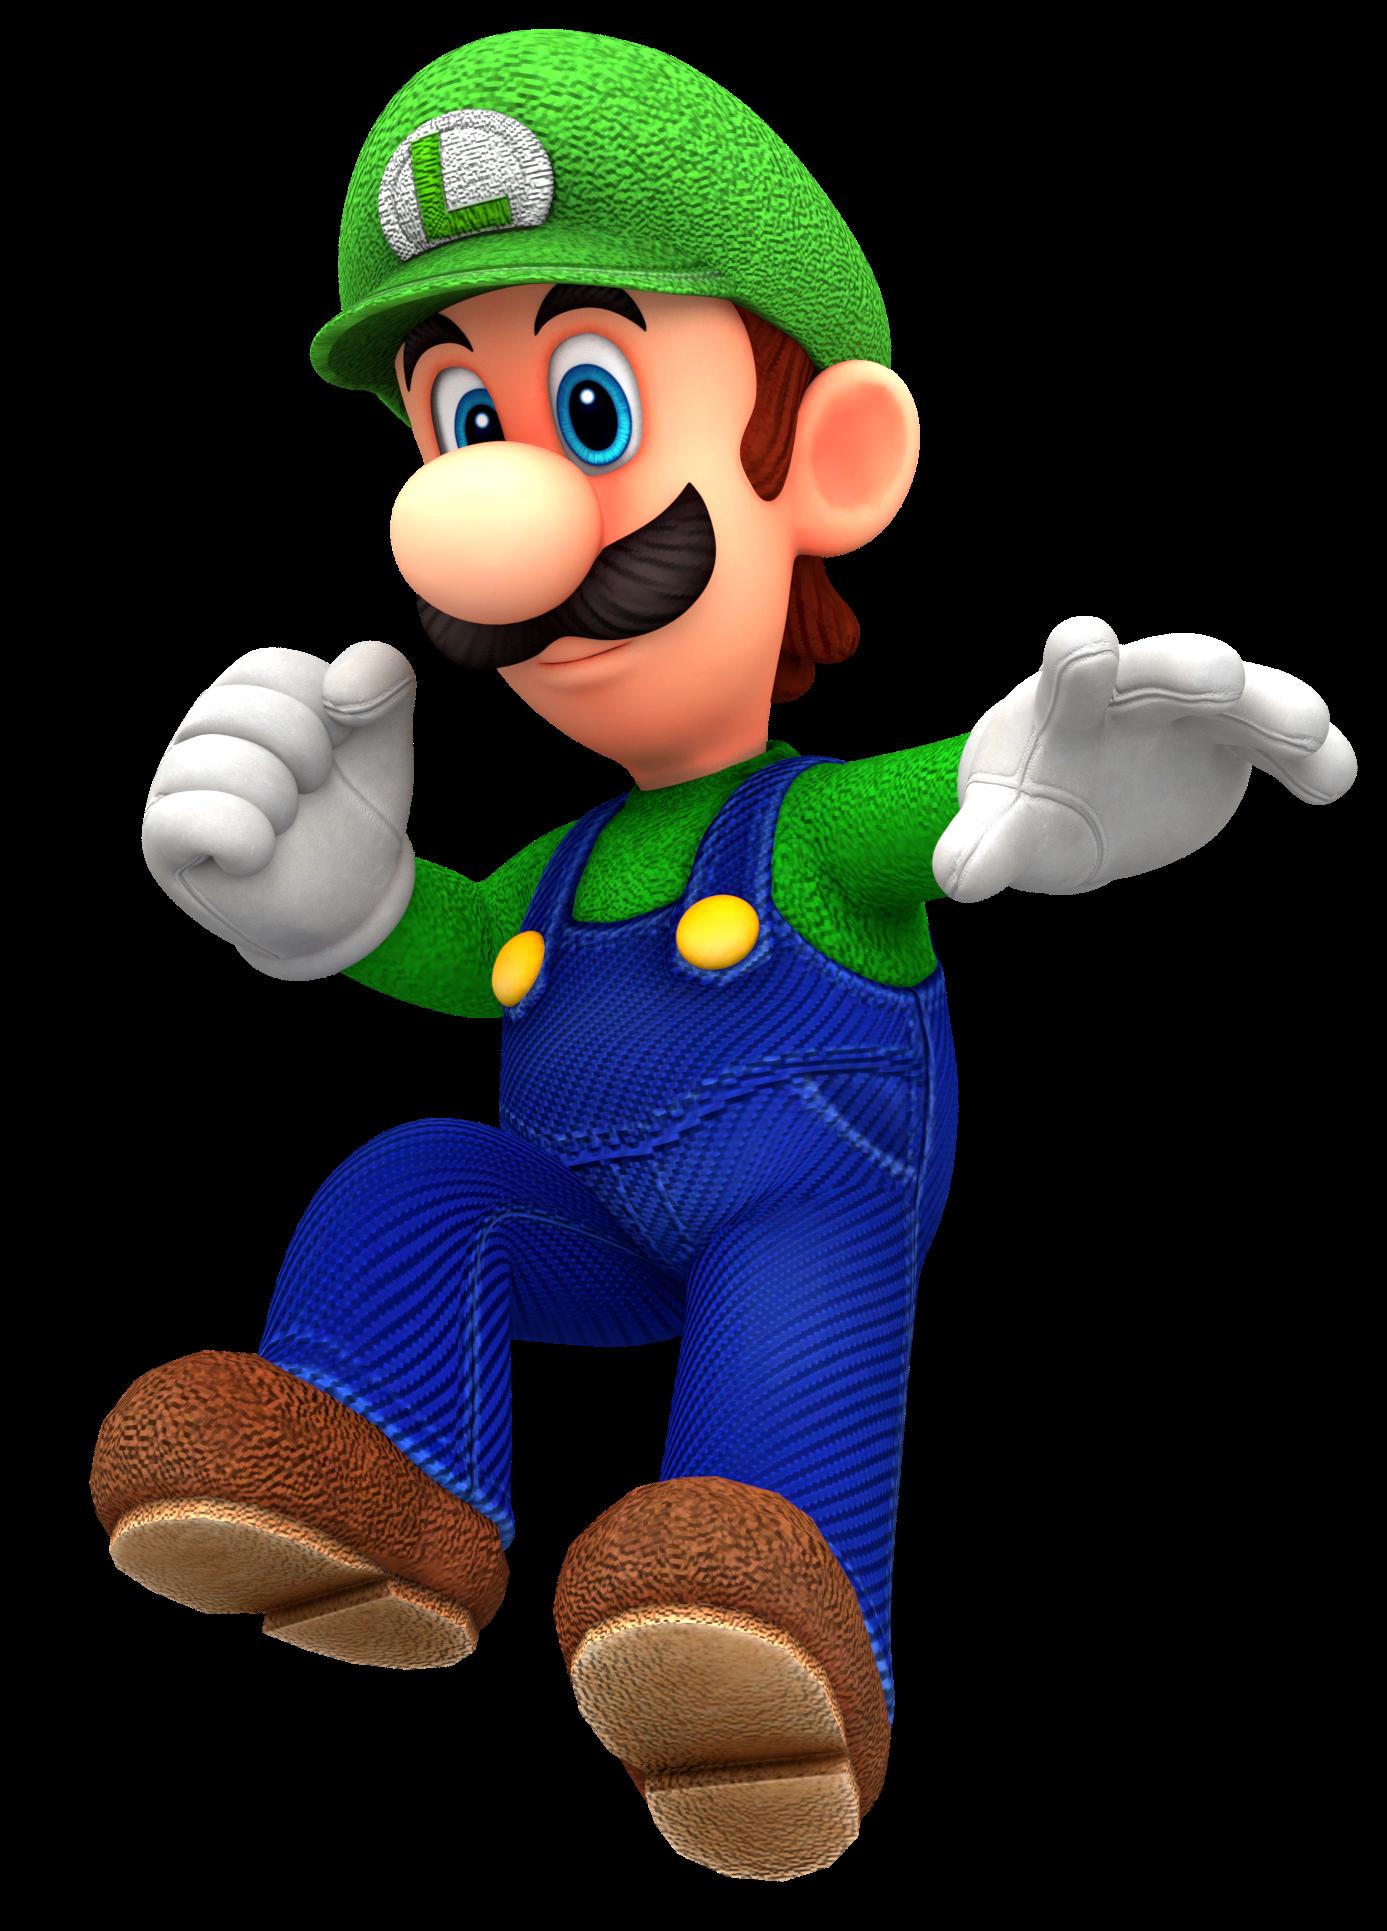 Odyssey Luigi Mpds Pose By Nintega Dario On Deviantart Luigi Mario And Luigi Mario